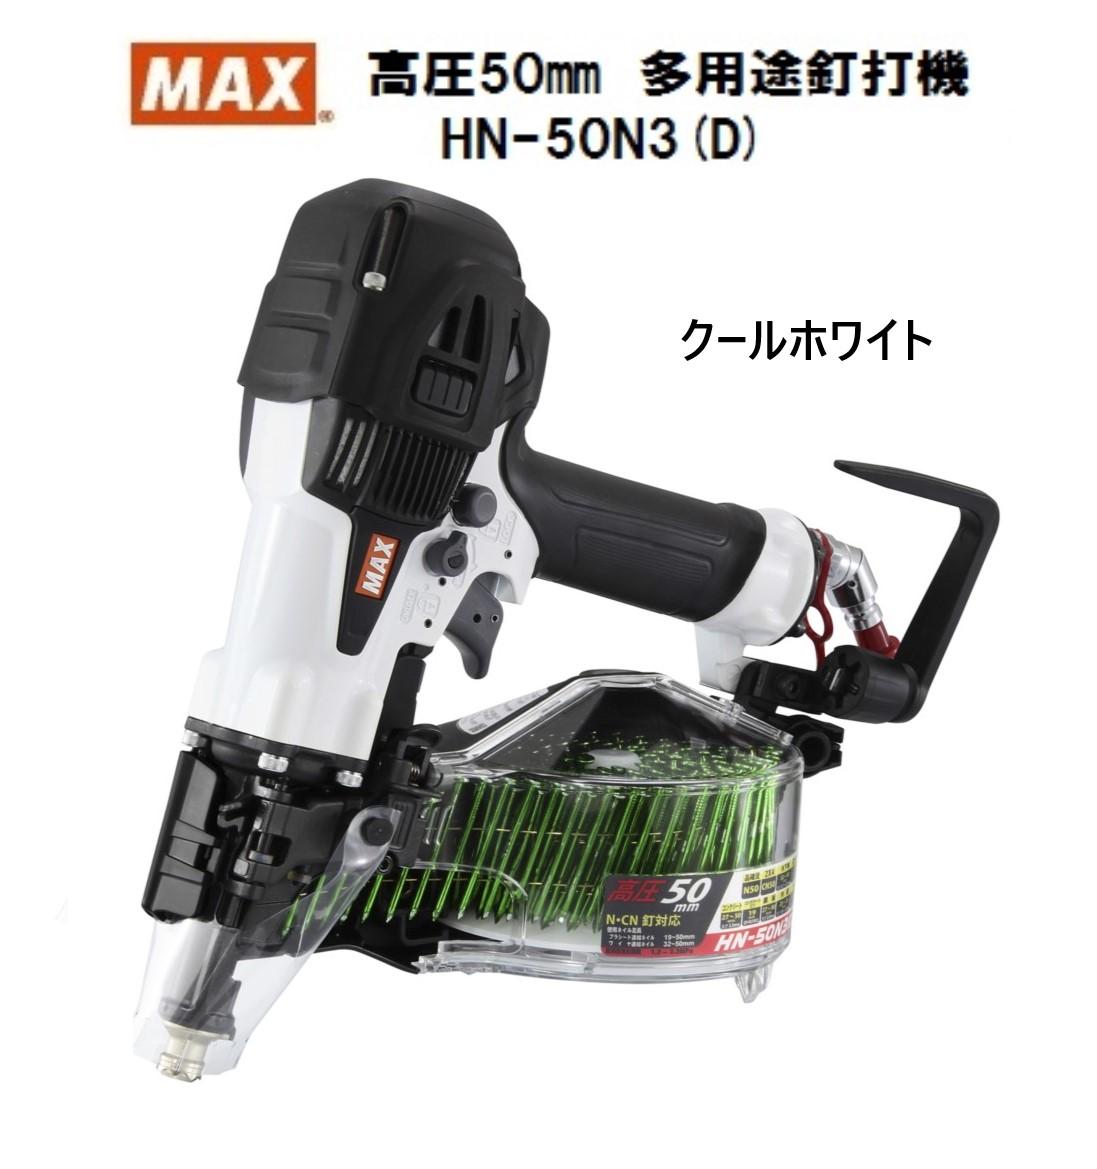 MAX マックス 高圧釘打機 HN‐50N3(D)クールホワイト  限定色  高圧コイルネイラ スーパーネイラ マックス釘打機  HN50N3 HN50N3D  HN‐50N3